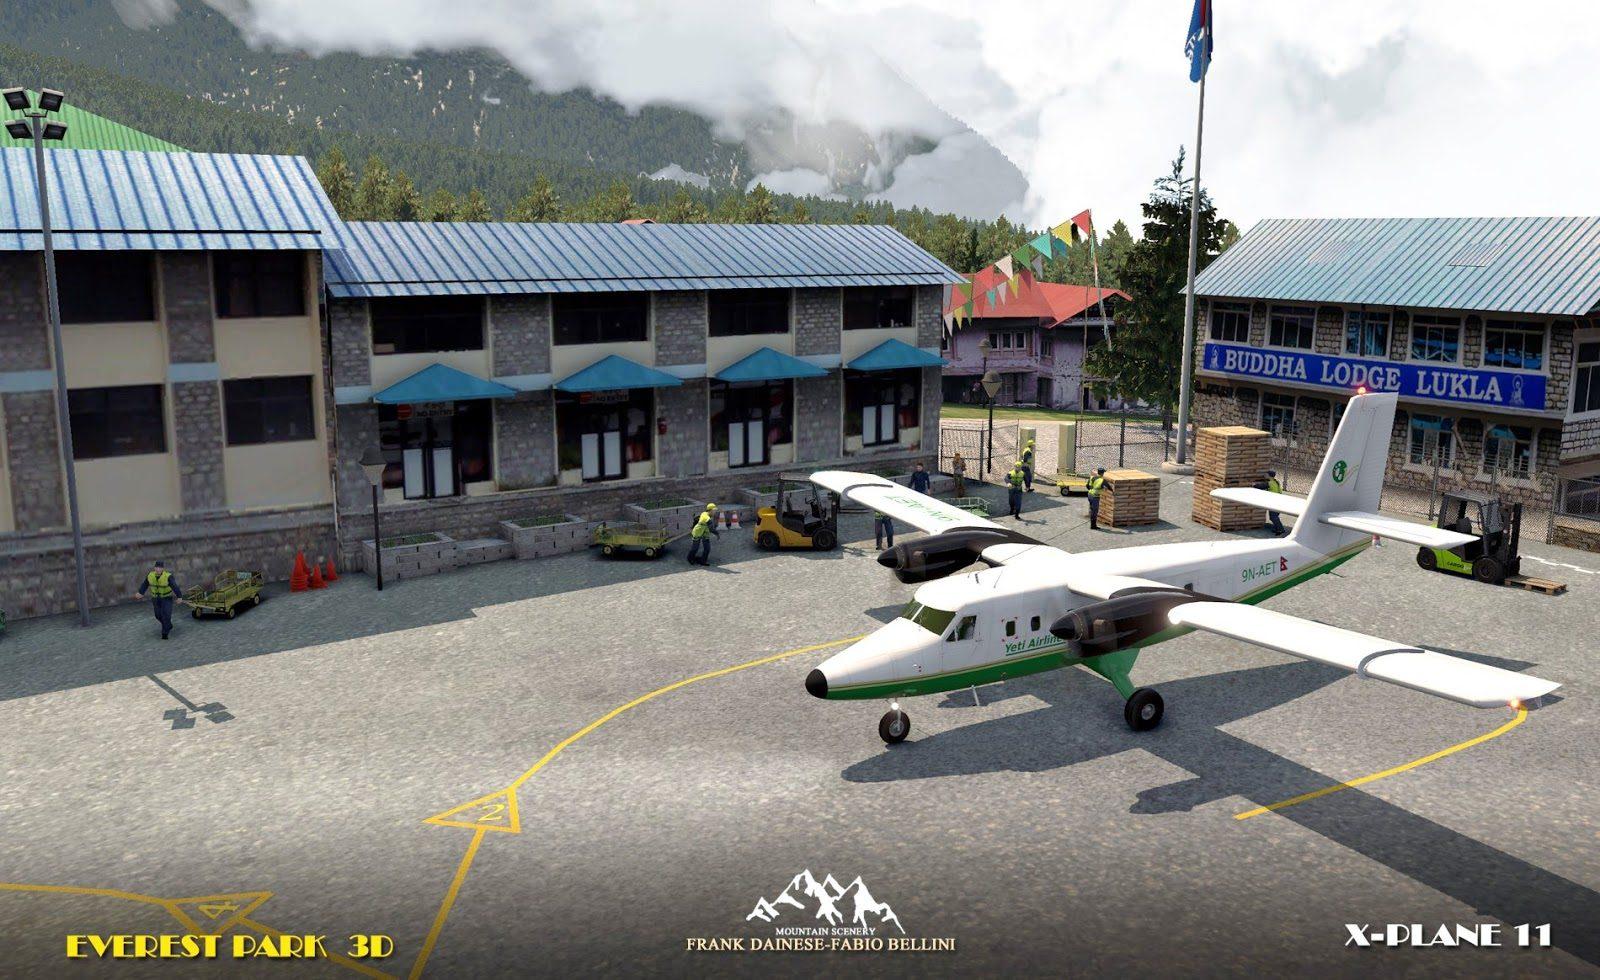 Frank Dainese and Fabio Bellini Release Everest Park 3D